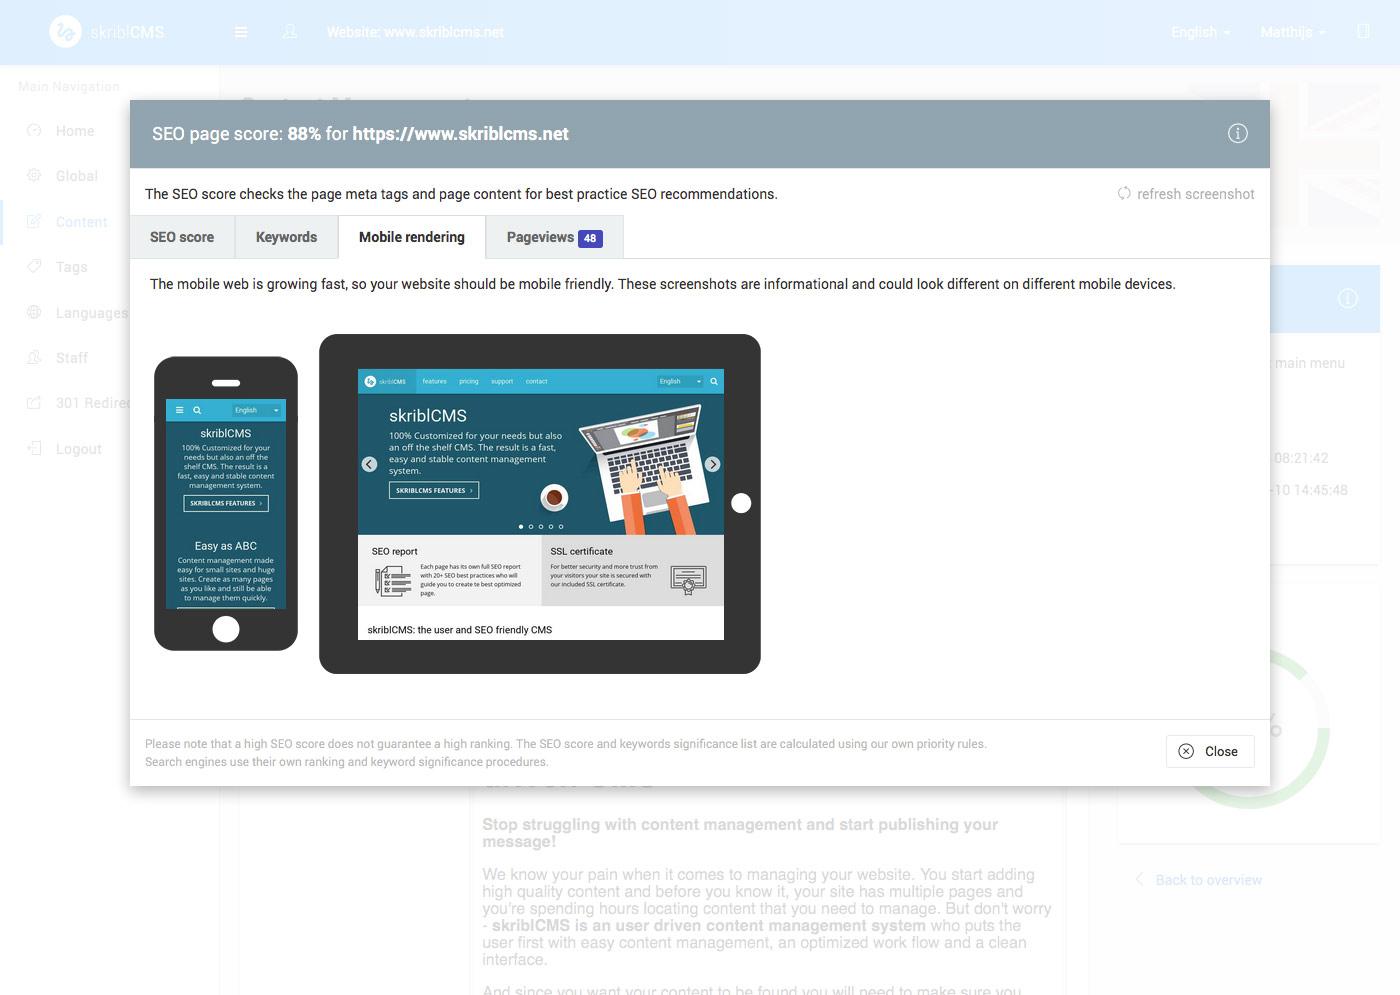 skriblCMS - SEO rapport derde TAB: Mobile rendering preview